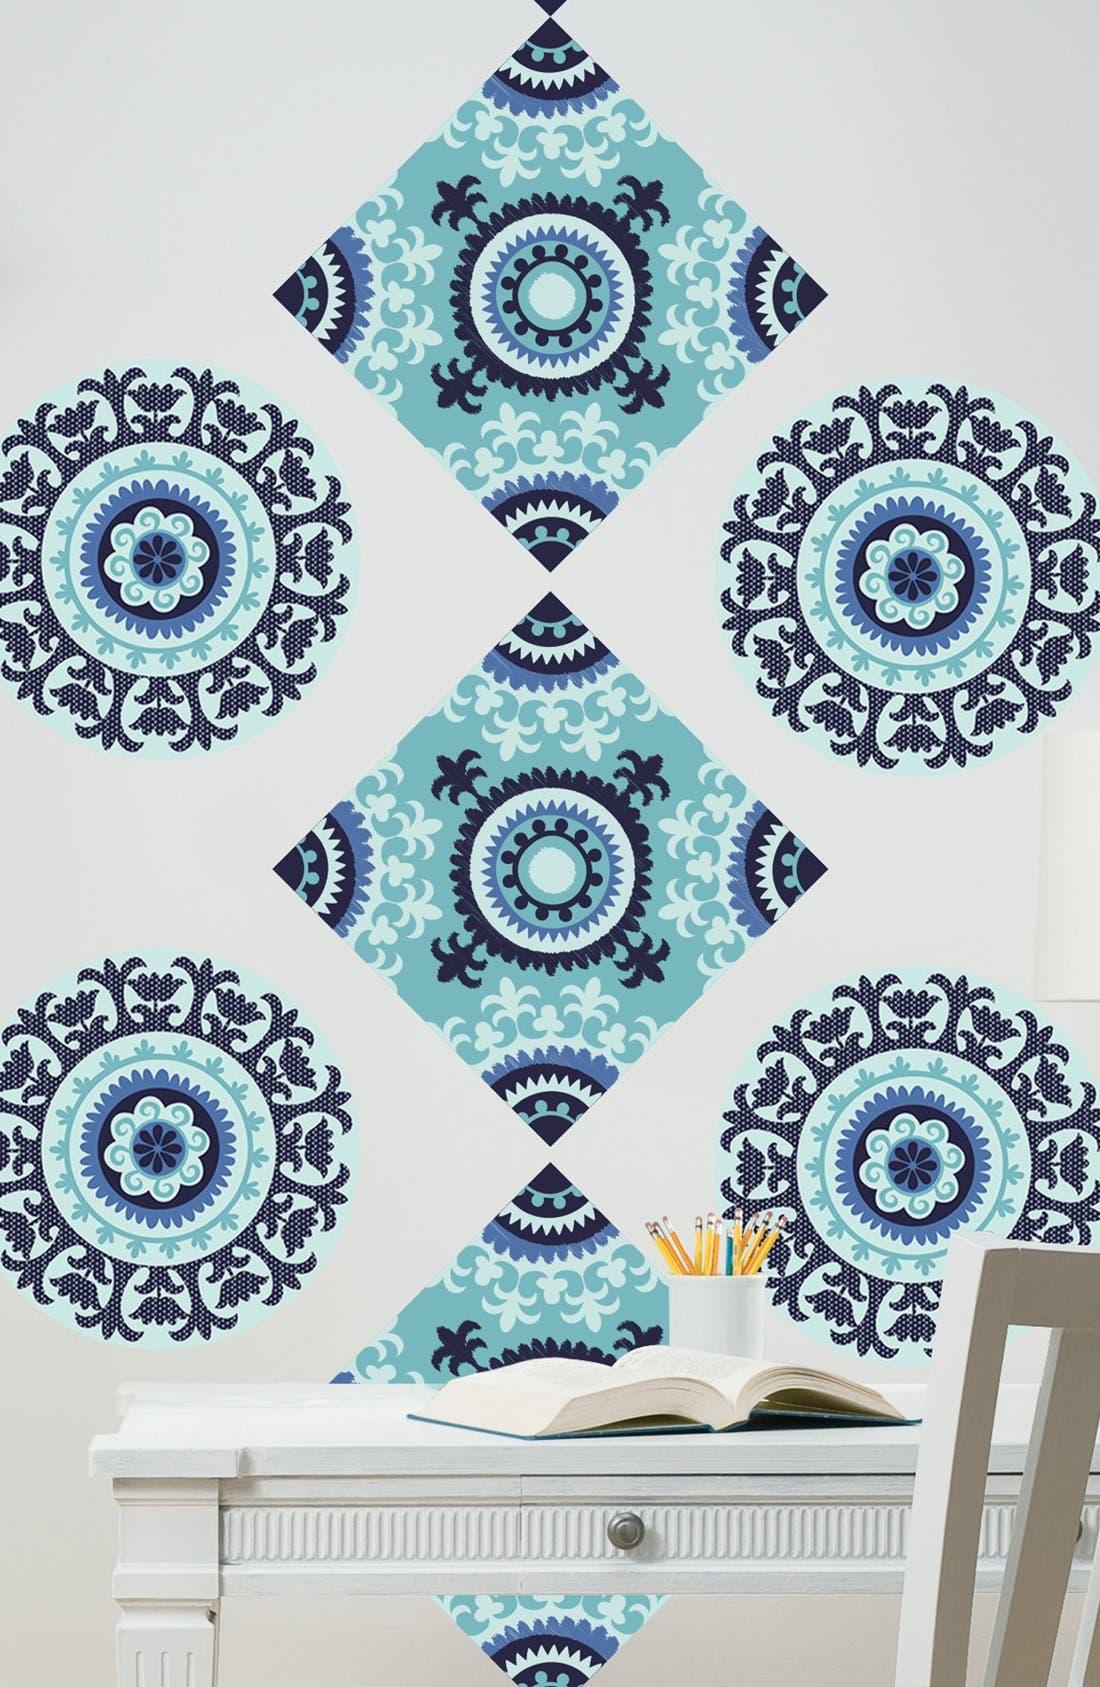 Alternate Image 1 Selected - Wallpops 'Malaya Dots & Blox' Wall Art